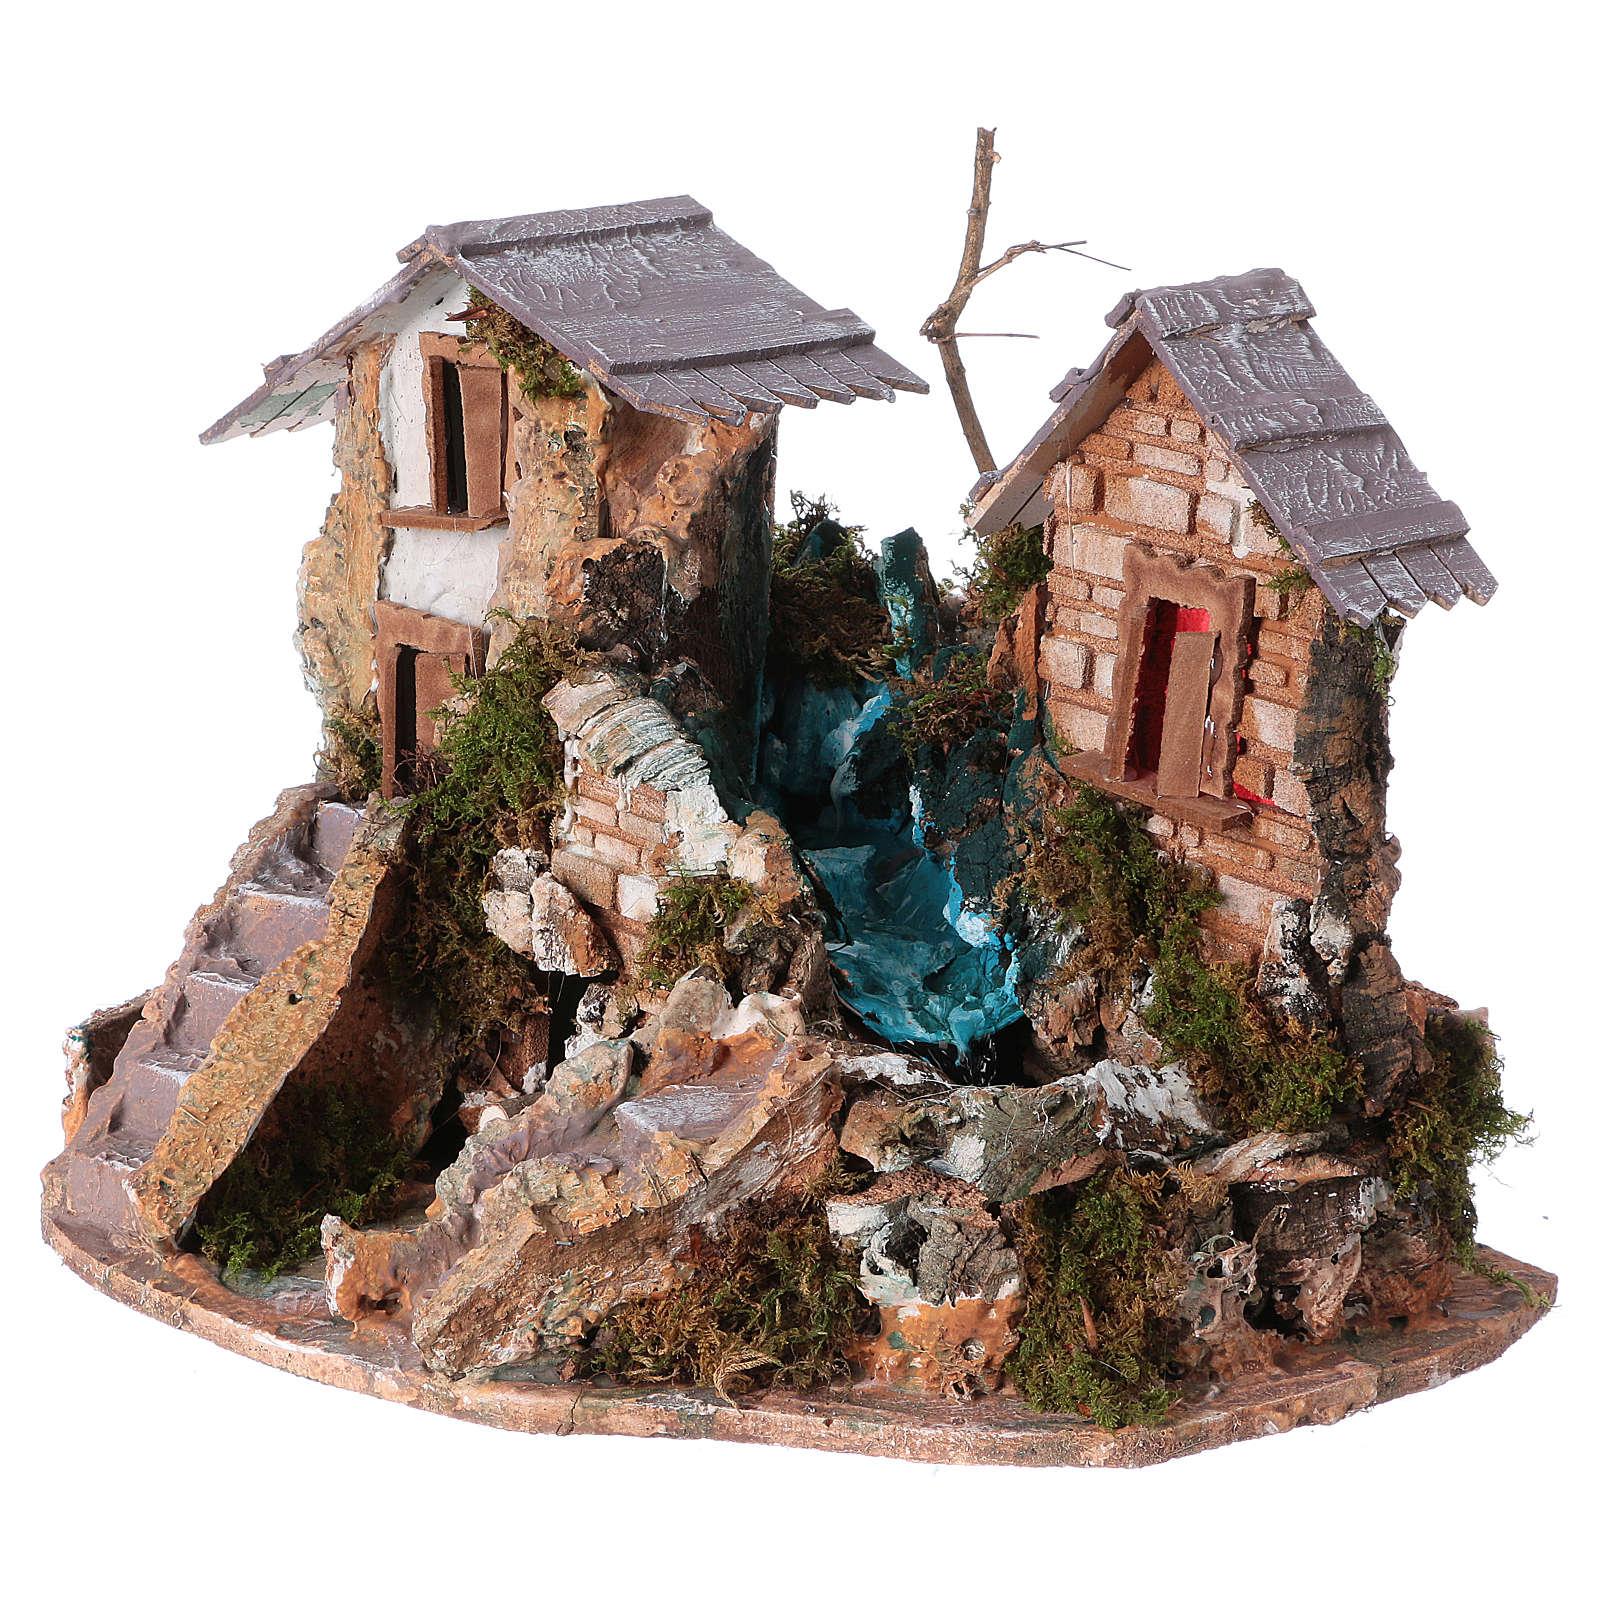 Nativity setting, waterfall between houses 4